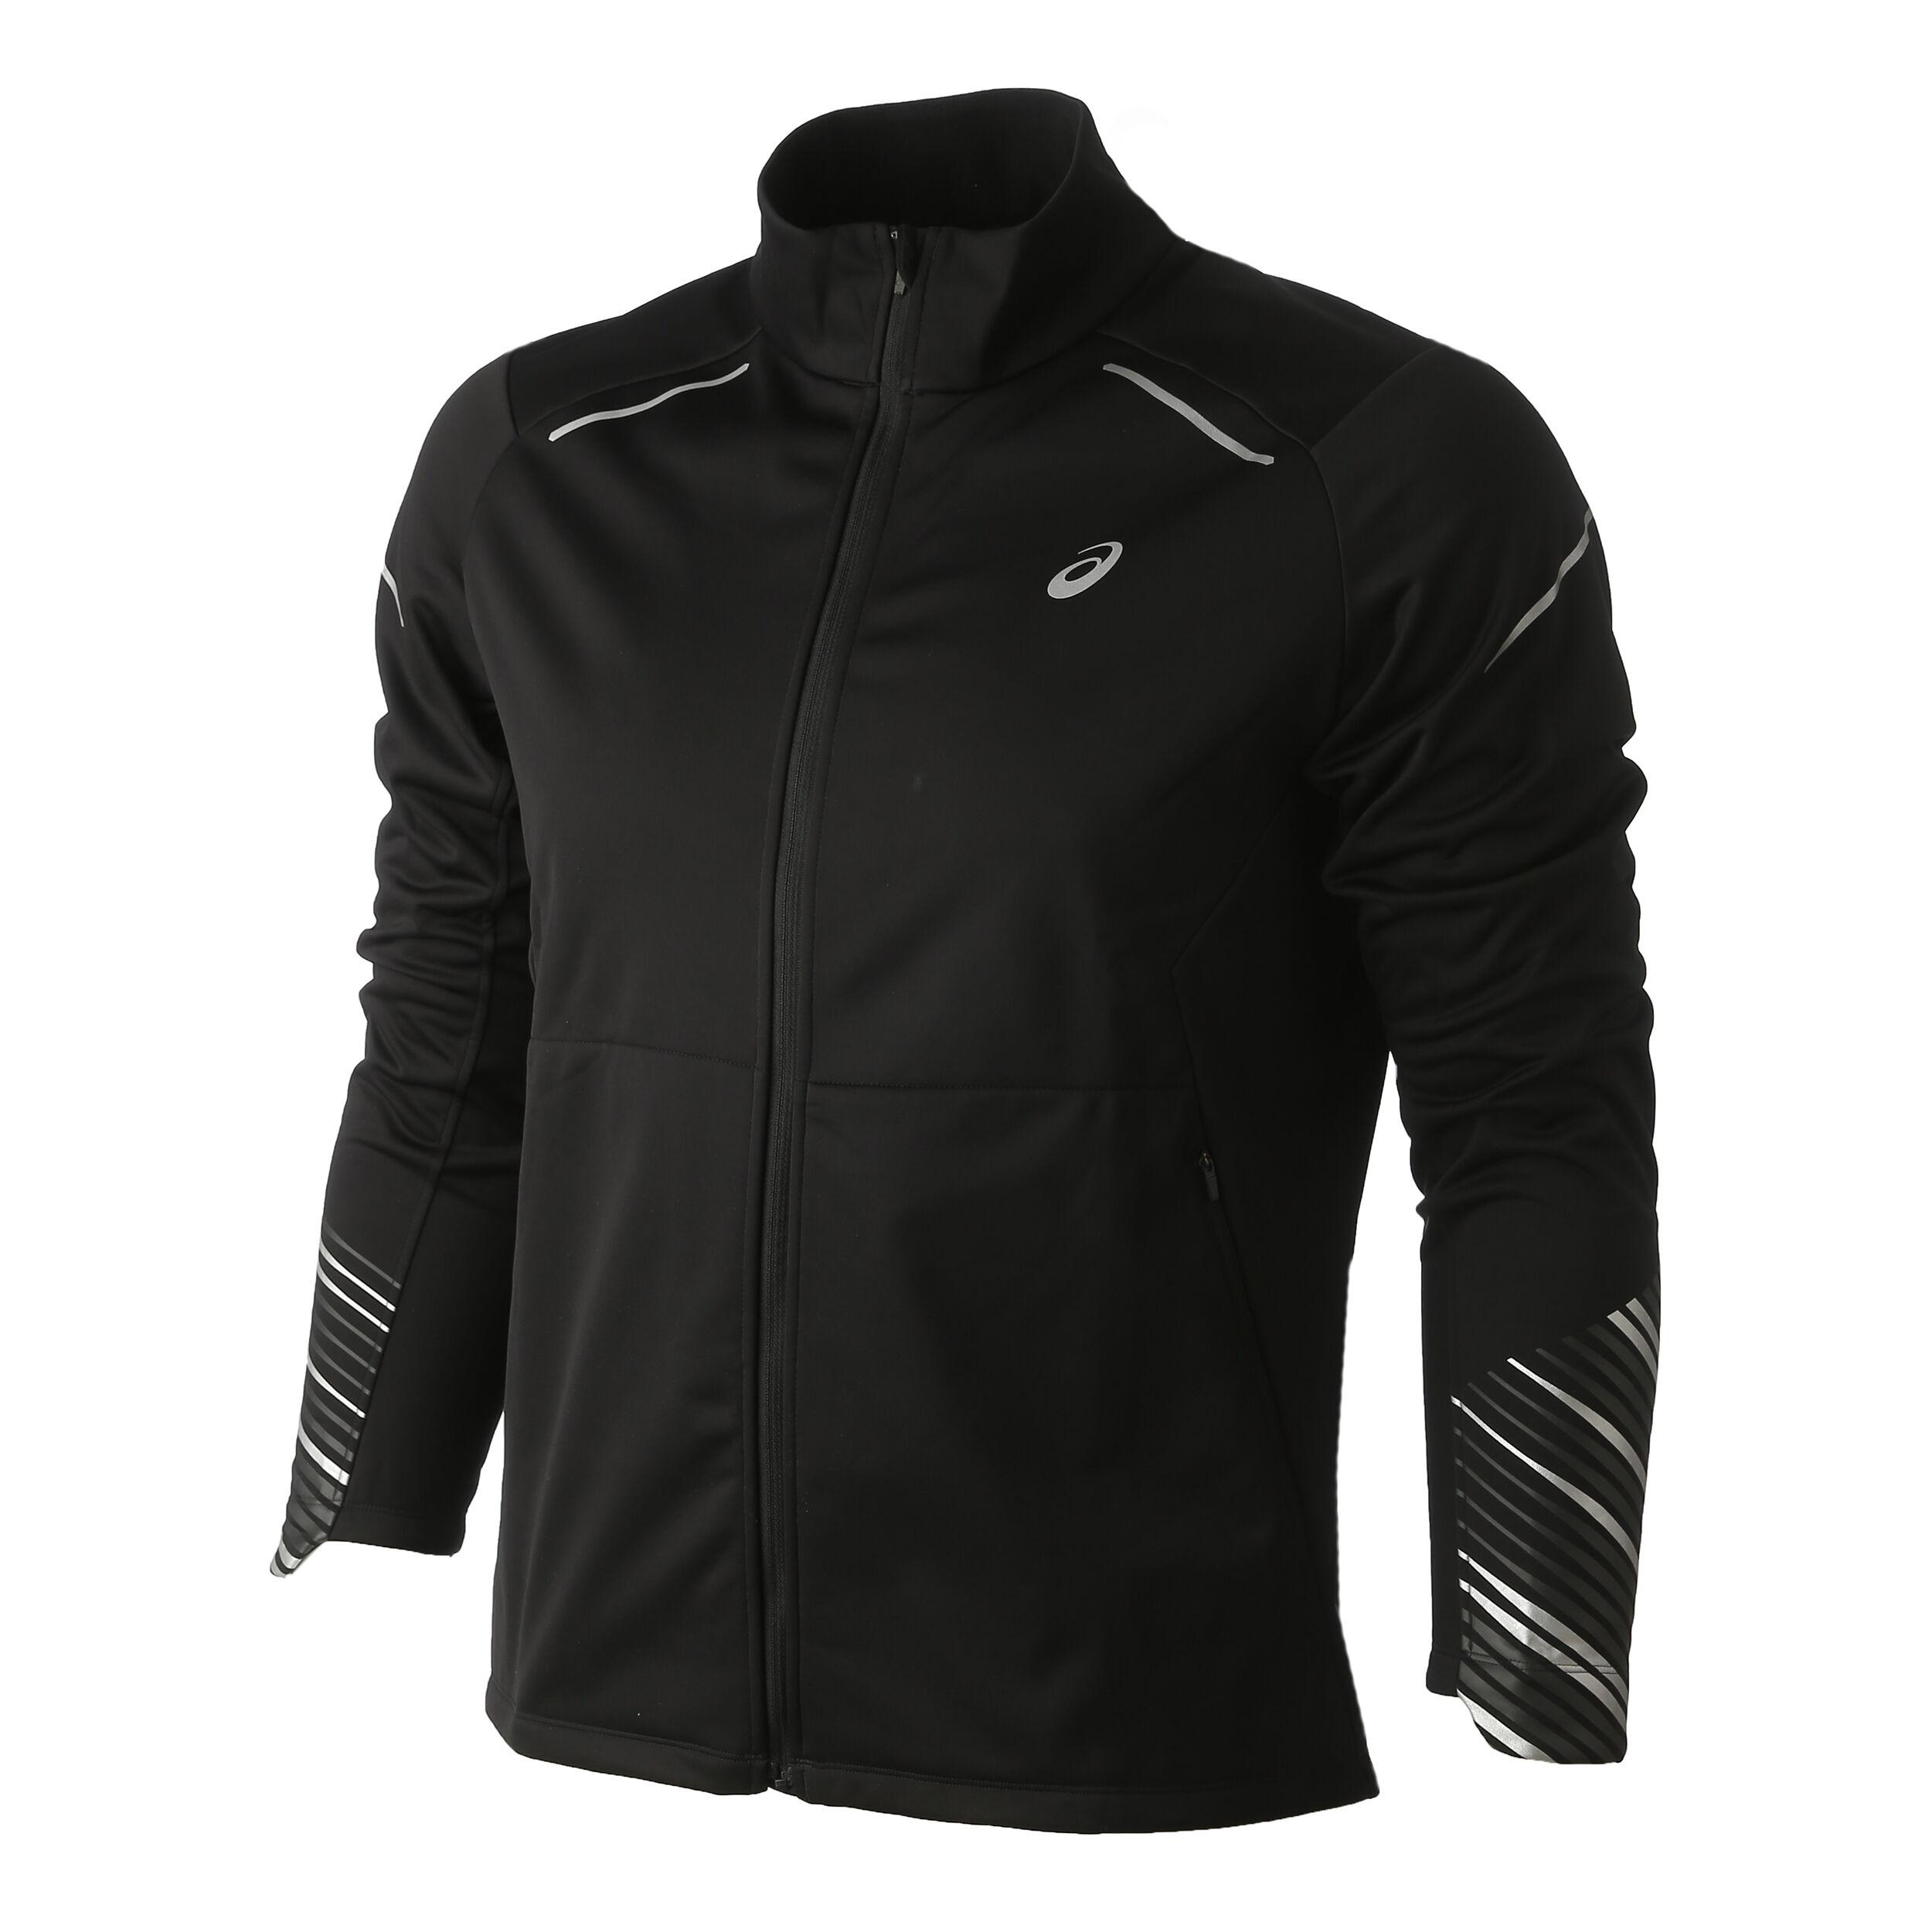 Asics Lite Show Winter Trainingsjacke Damen Dunkelgrün | online kaufen | Tennis Point